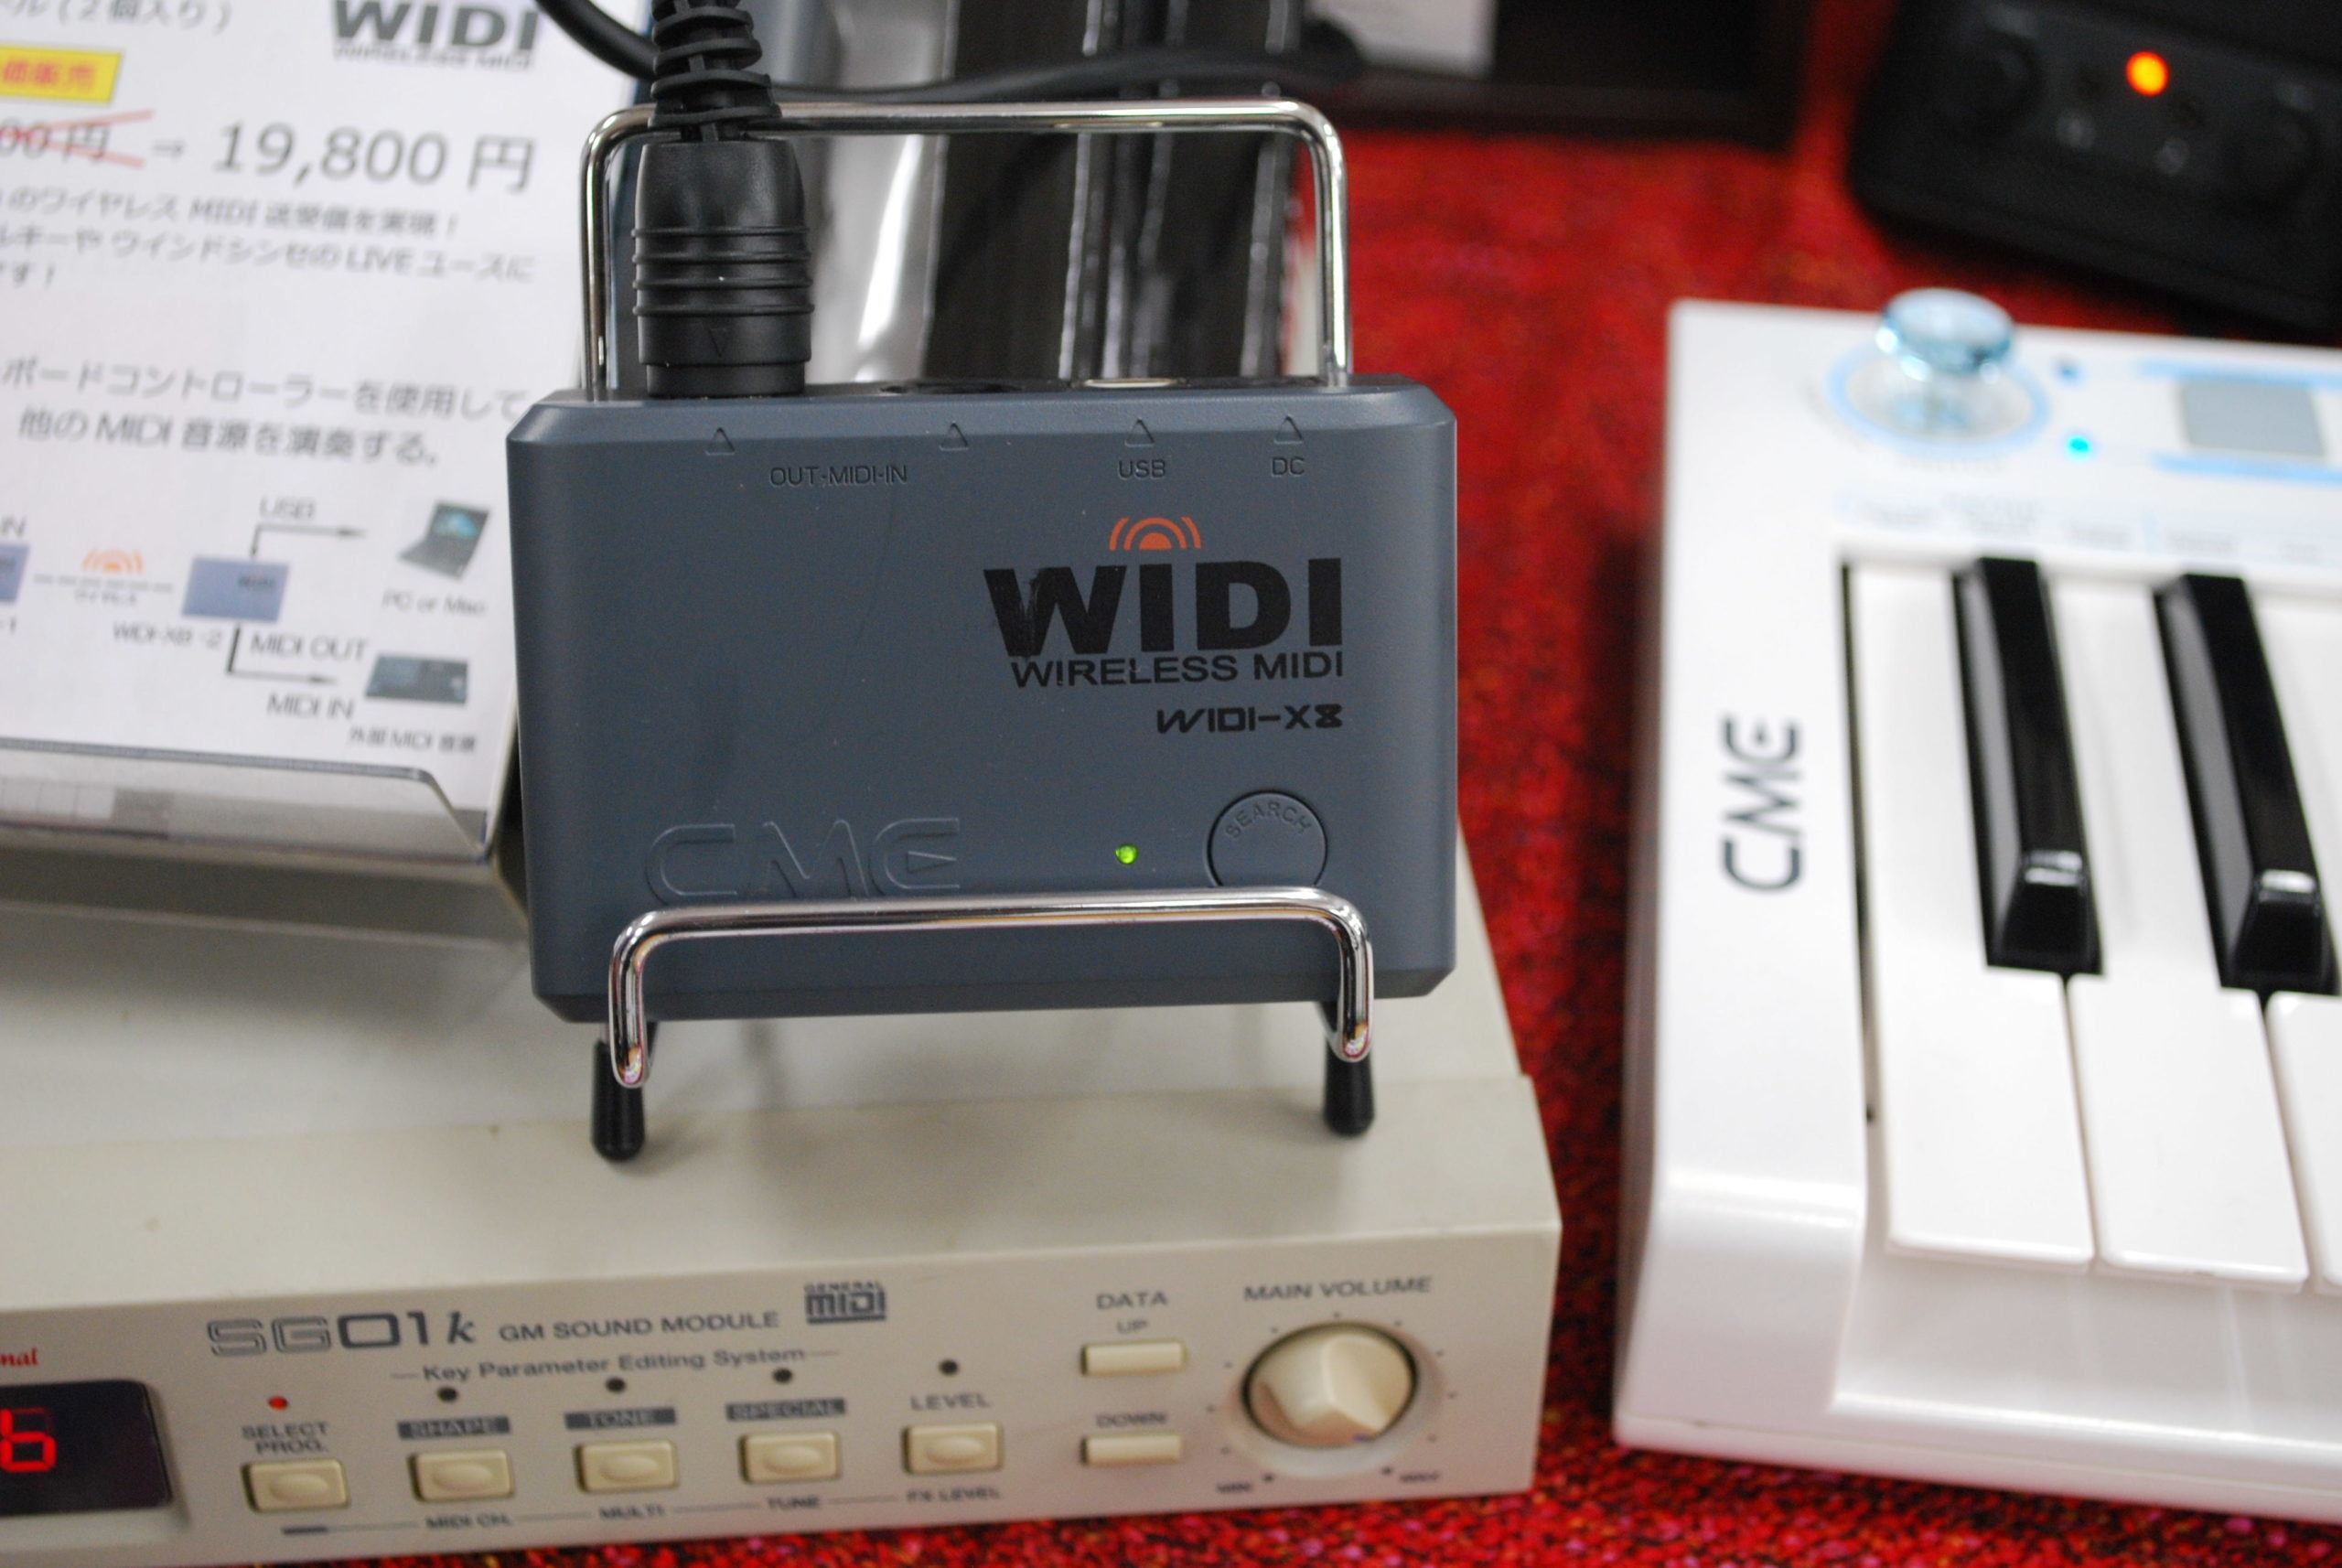 WIDI X8